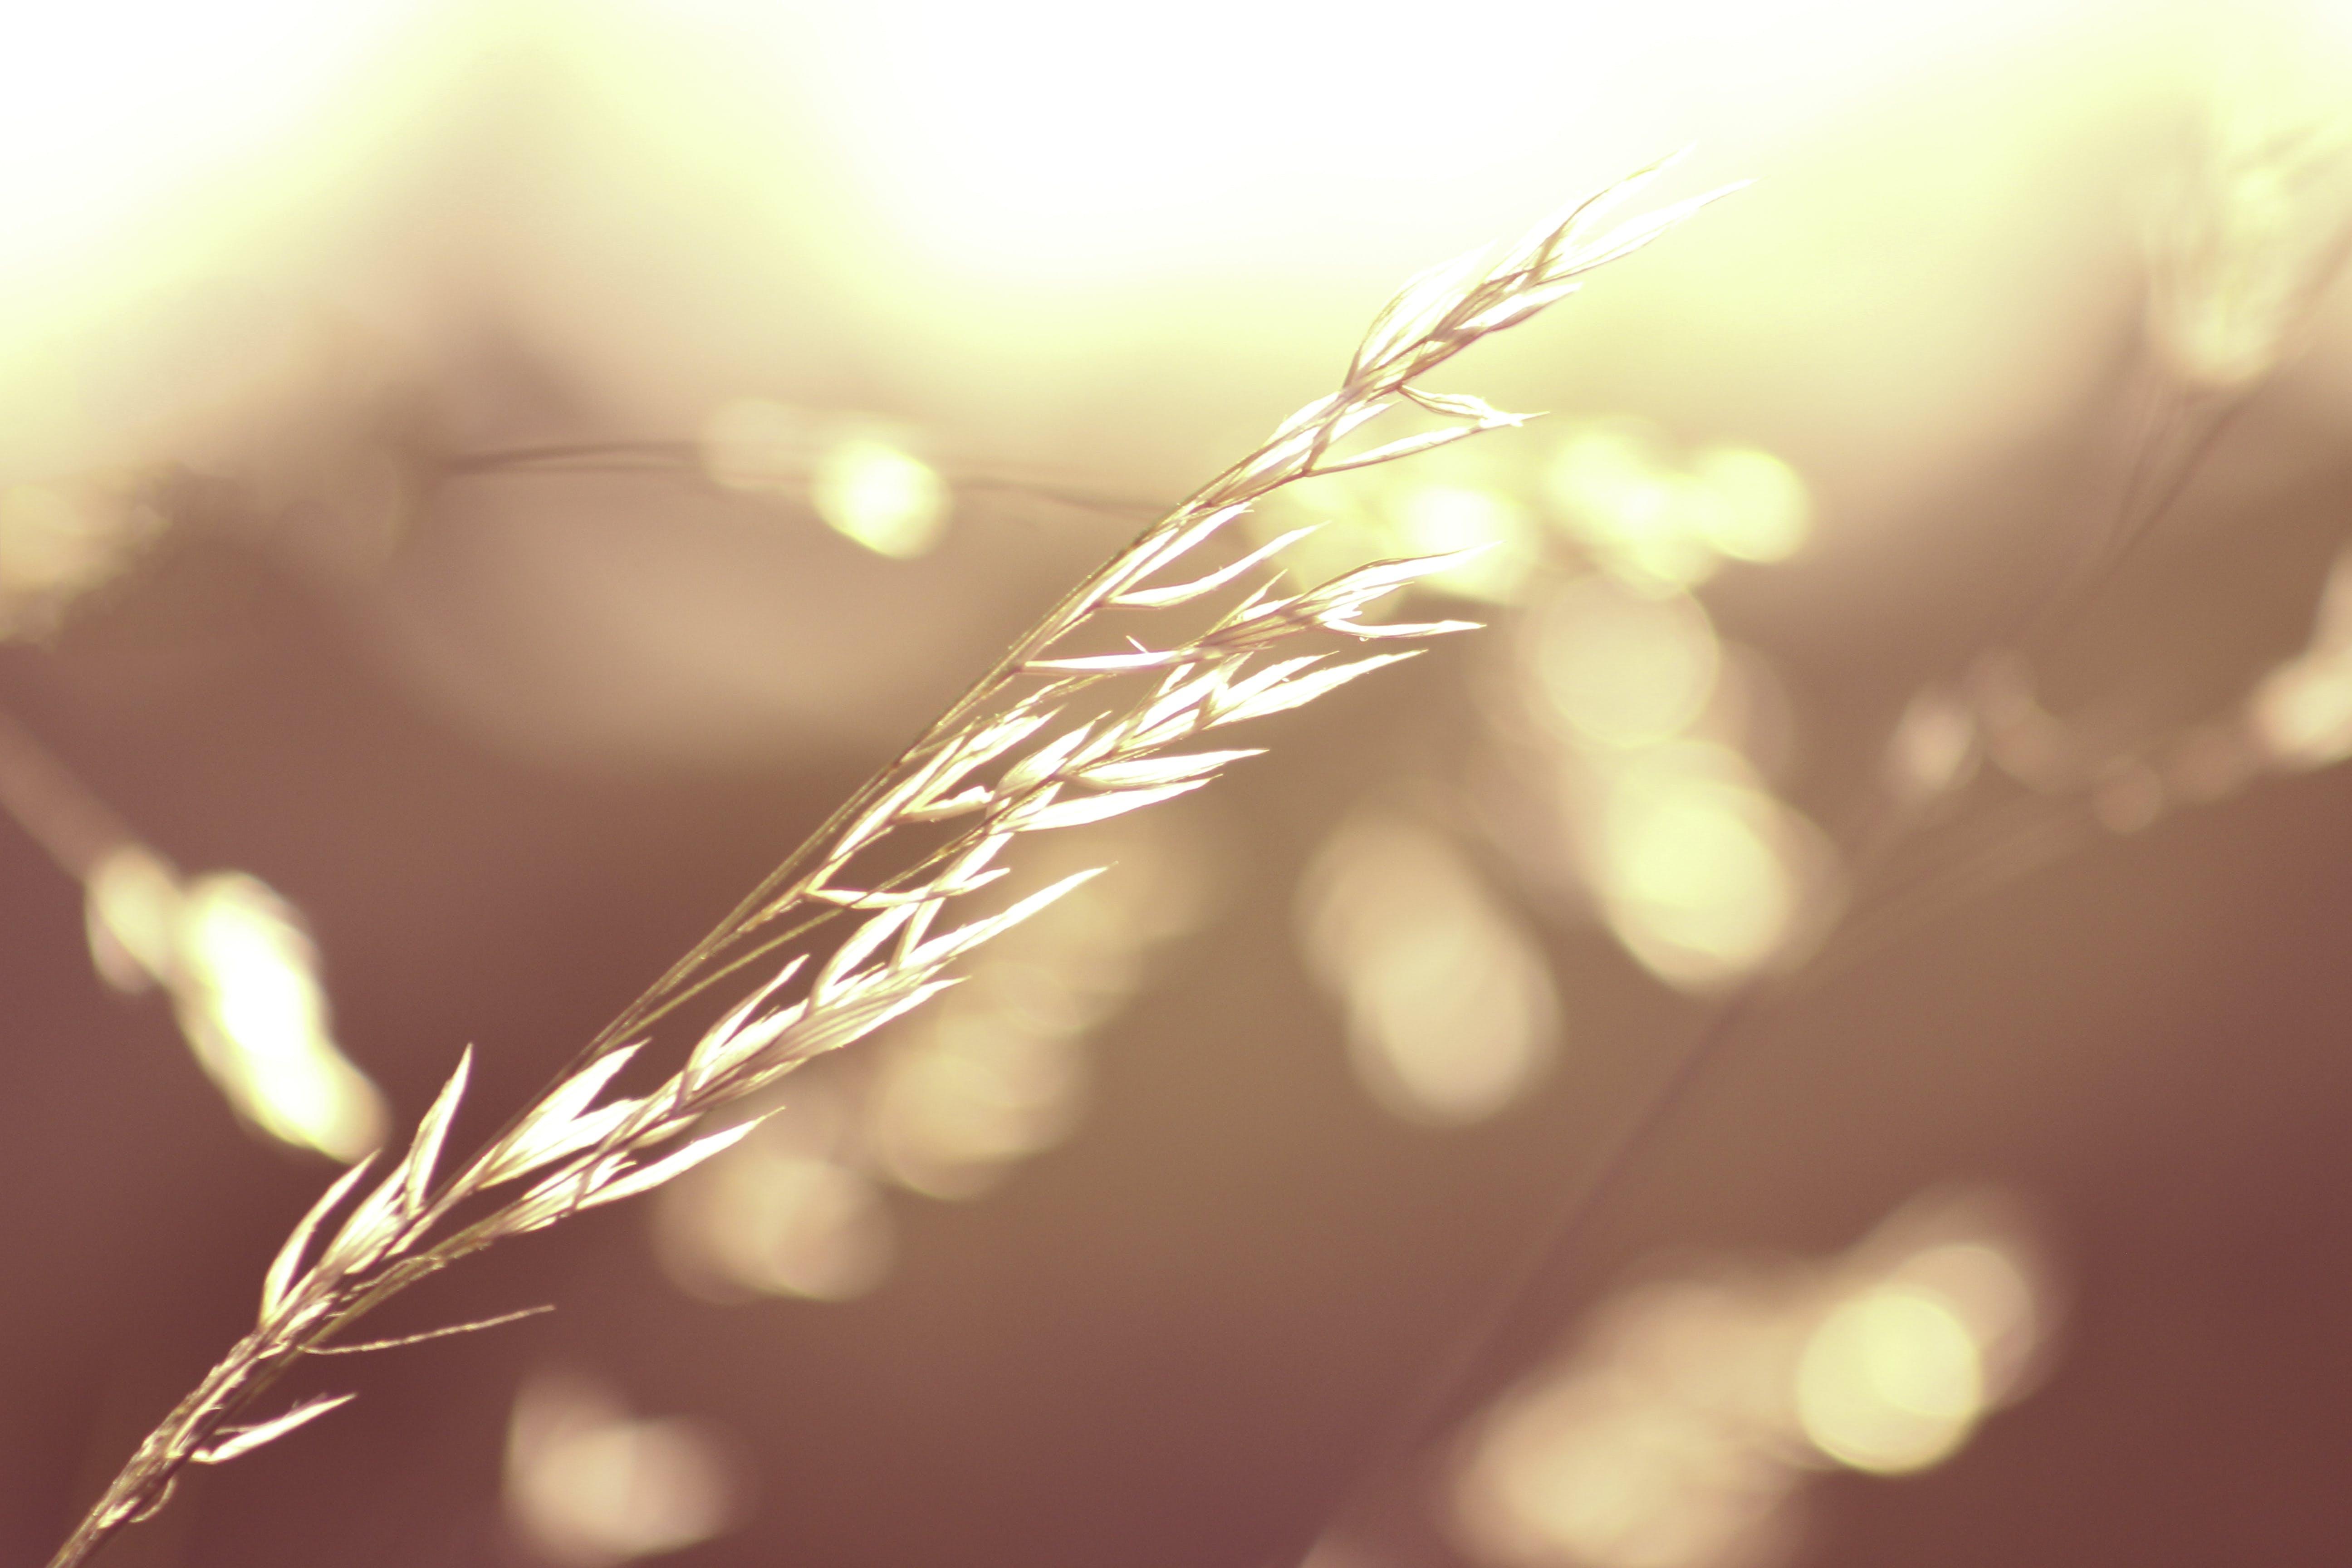 Gratis stockfoto met tarwe, tarwegras